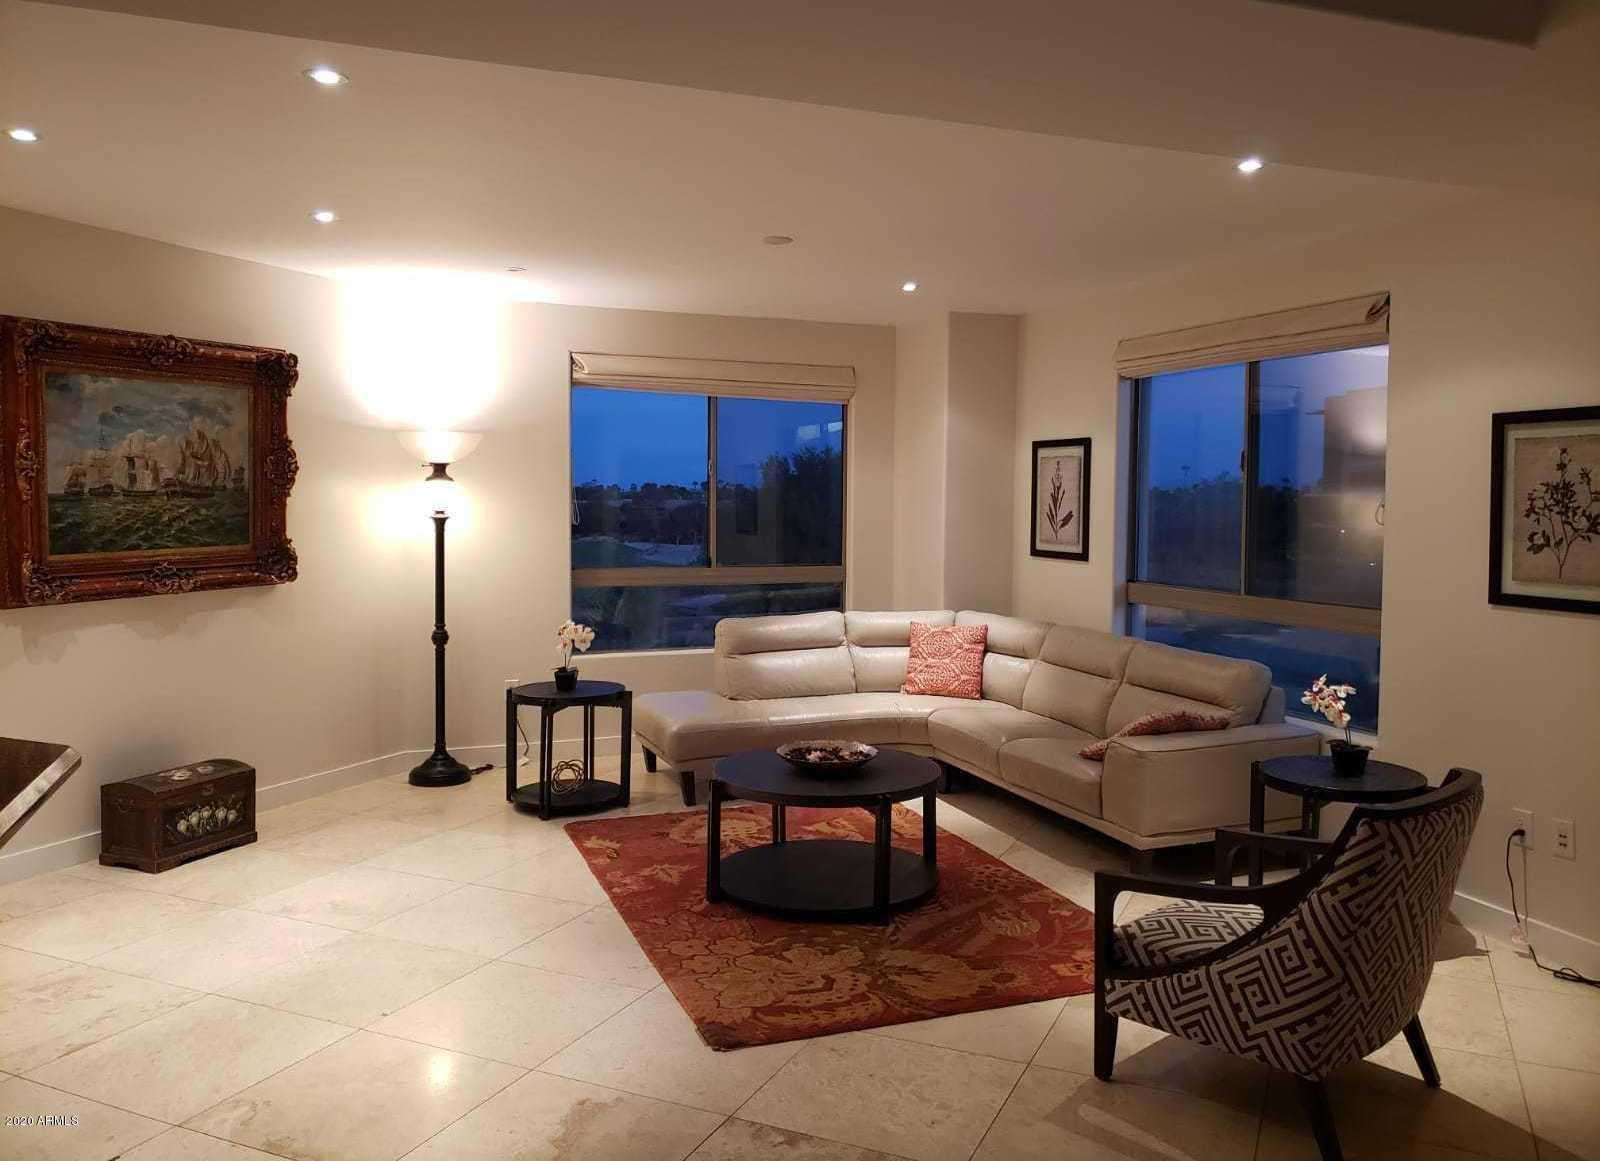 $1,290,000 - 3Br/3Ba -  for Sale in Landmark Condominium Amd, Scottsdale